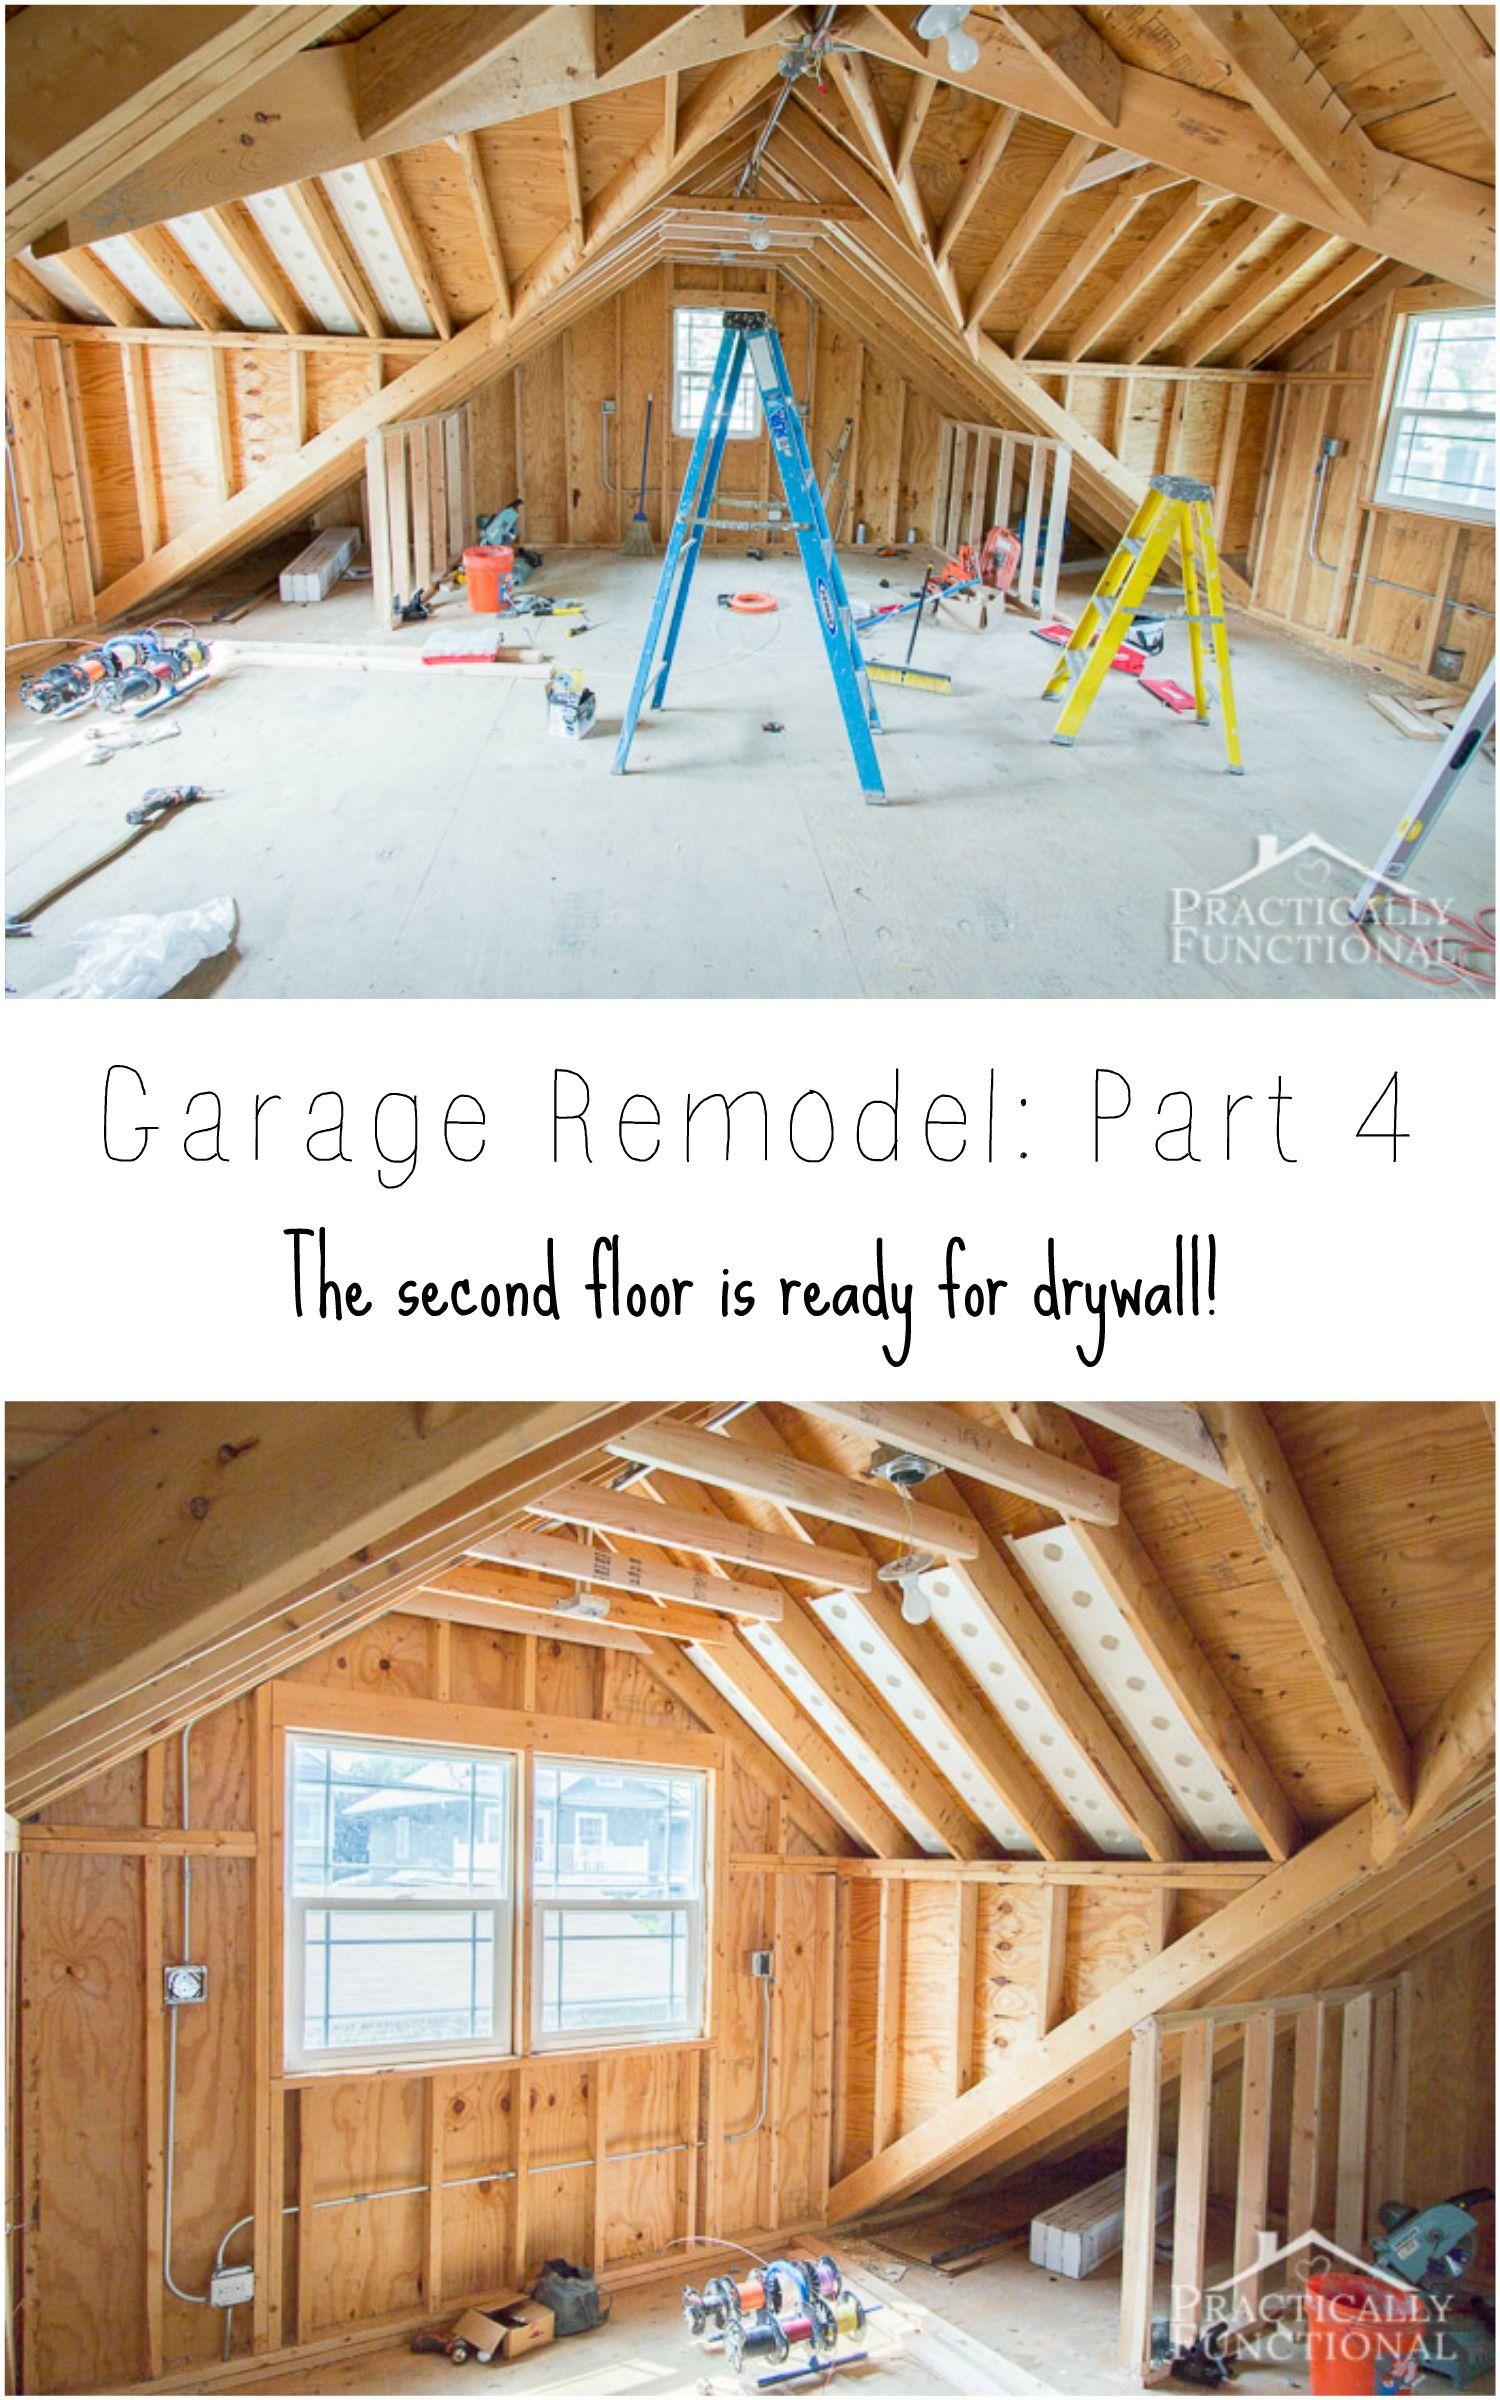 Garage Remodel Progress Upper Floor Framing And Electrical Work Practically Functional Remodel Bedroom Remodel Kids Bedroom Remodel